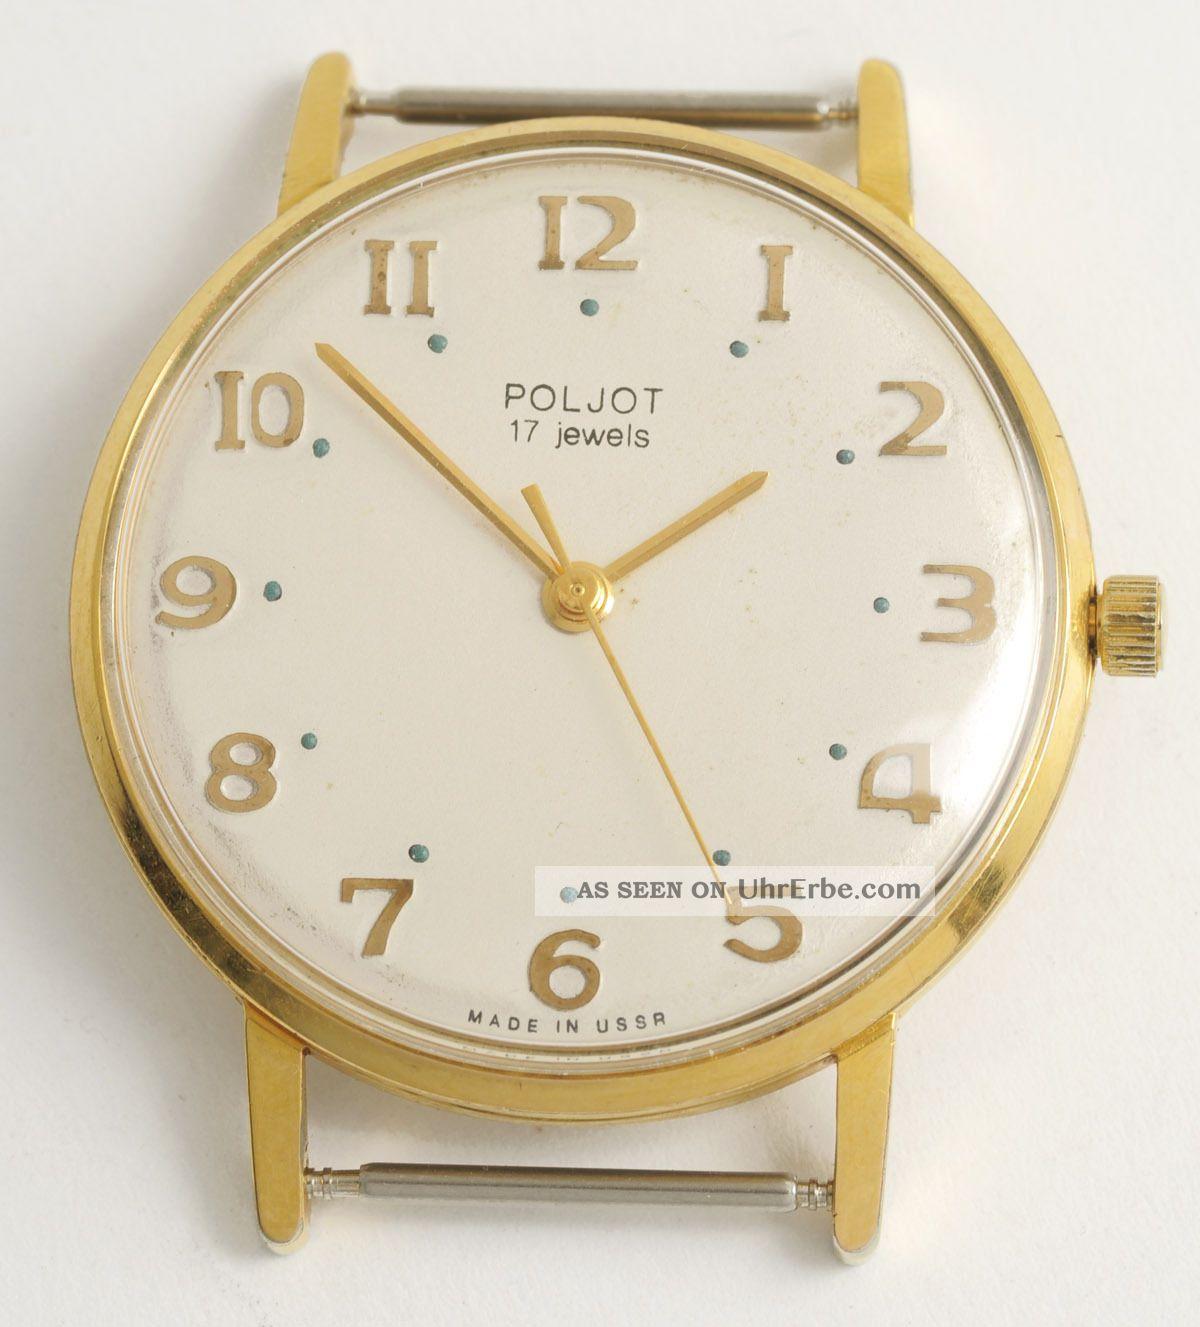 Poljot Klassische,  Elegante Soviet Armbanduhr.  Made In Ussr Vintage Dress Watch. Armbanduhren Bild